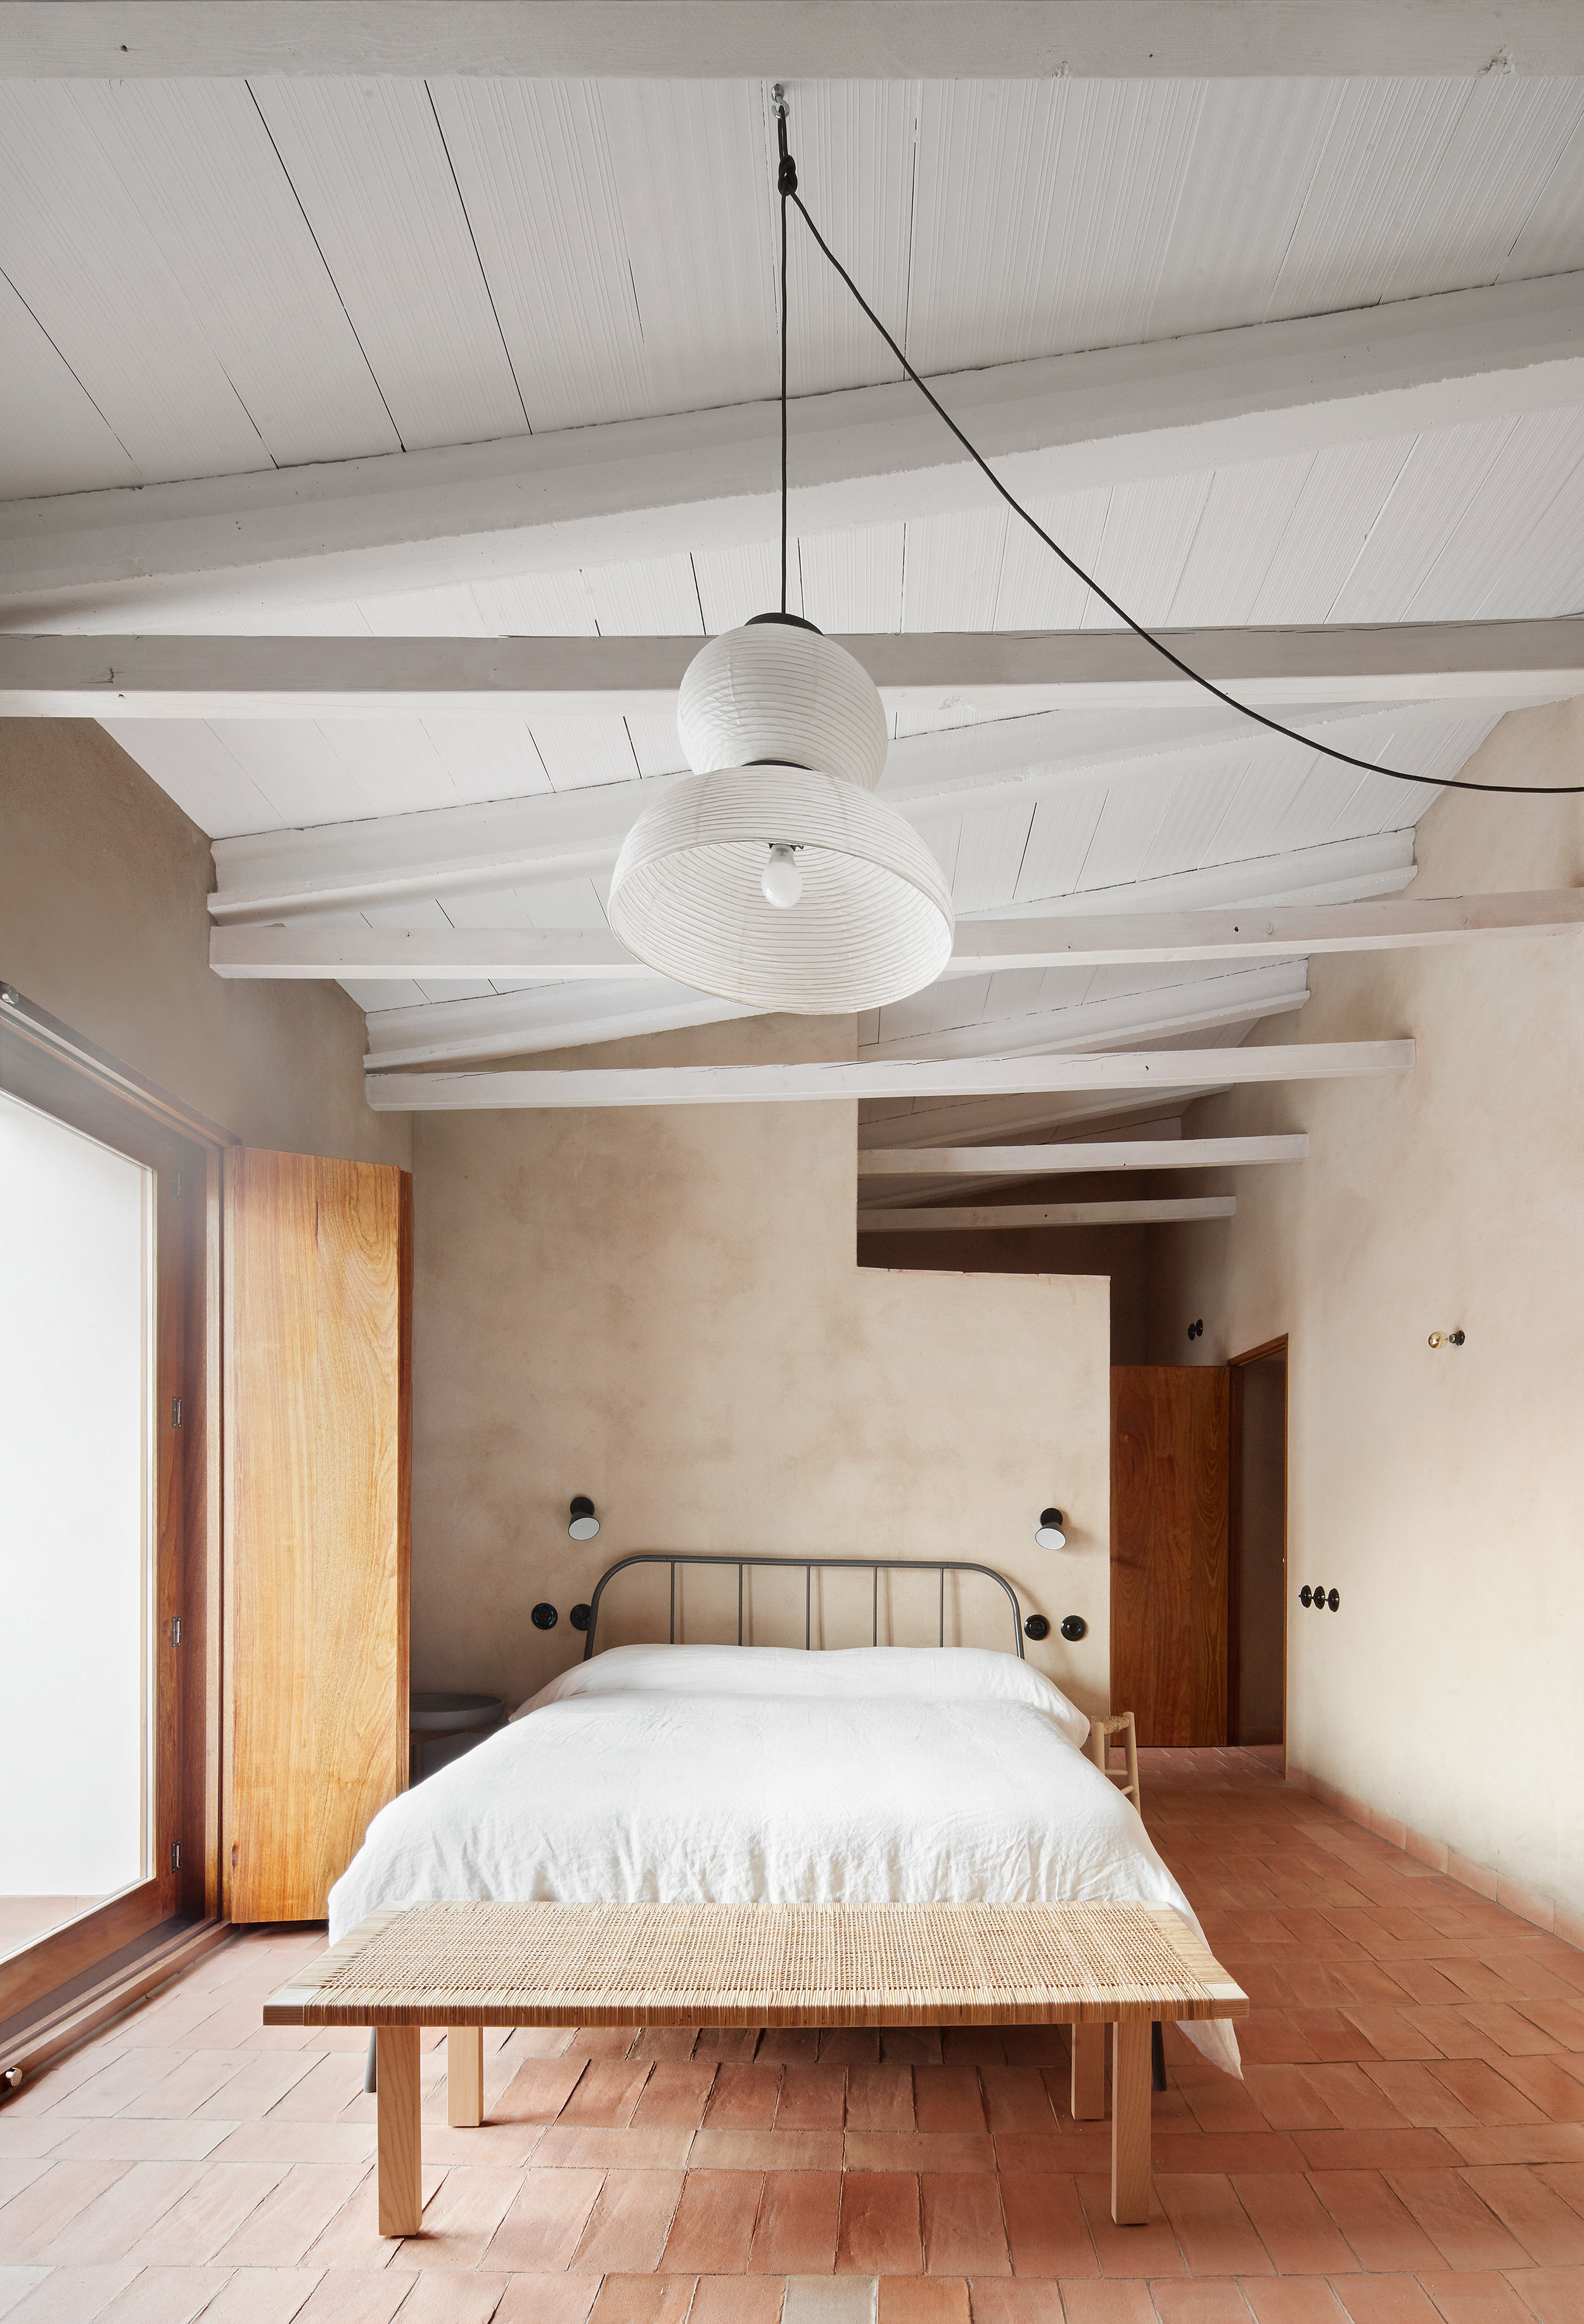 La Hermandad de Villalba guesthouse, Spain, by Lucas Y Hernández-Gil, completed 2019